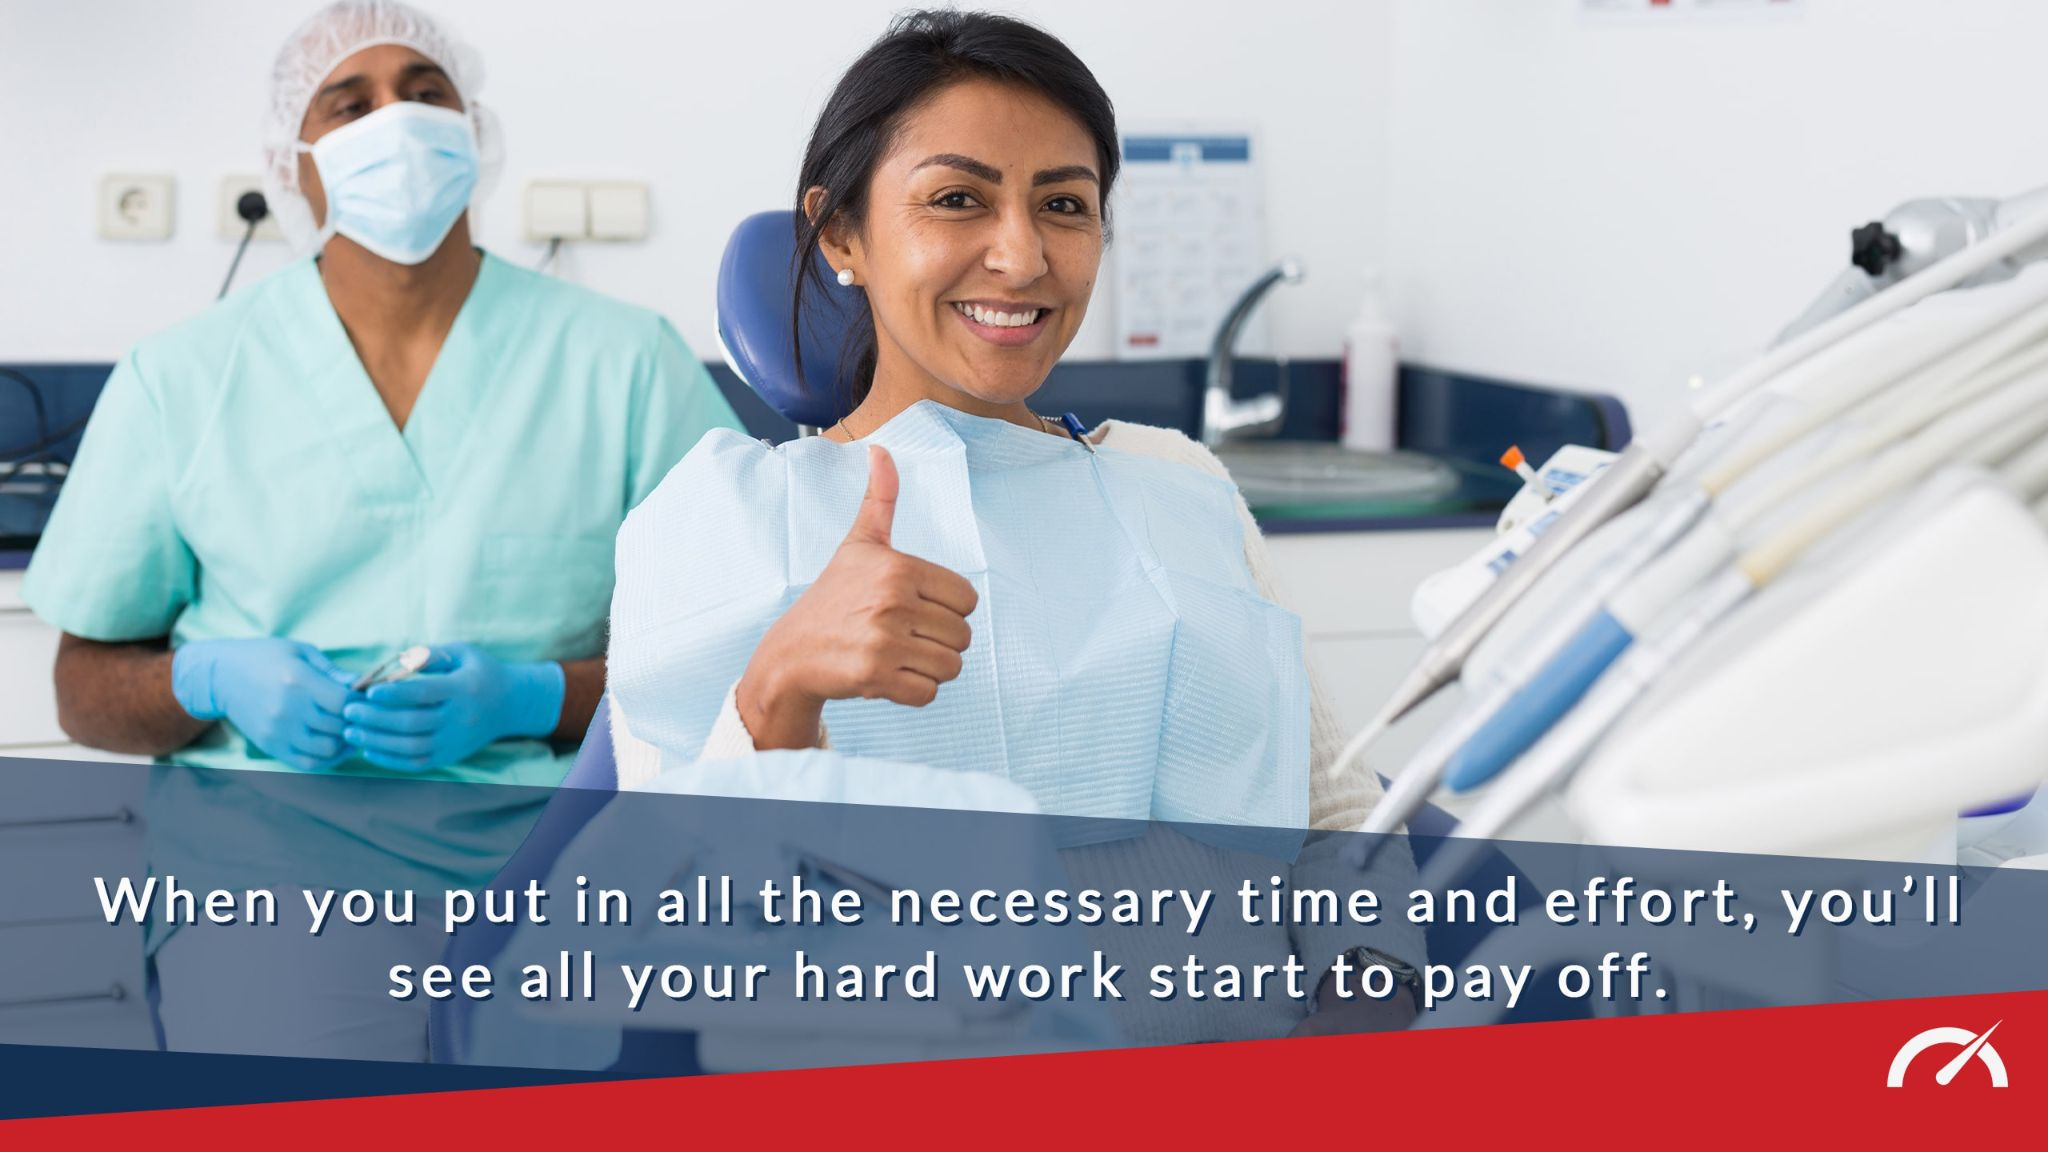 Dental Sleep Medicine and Airway Dentistry Marketing